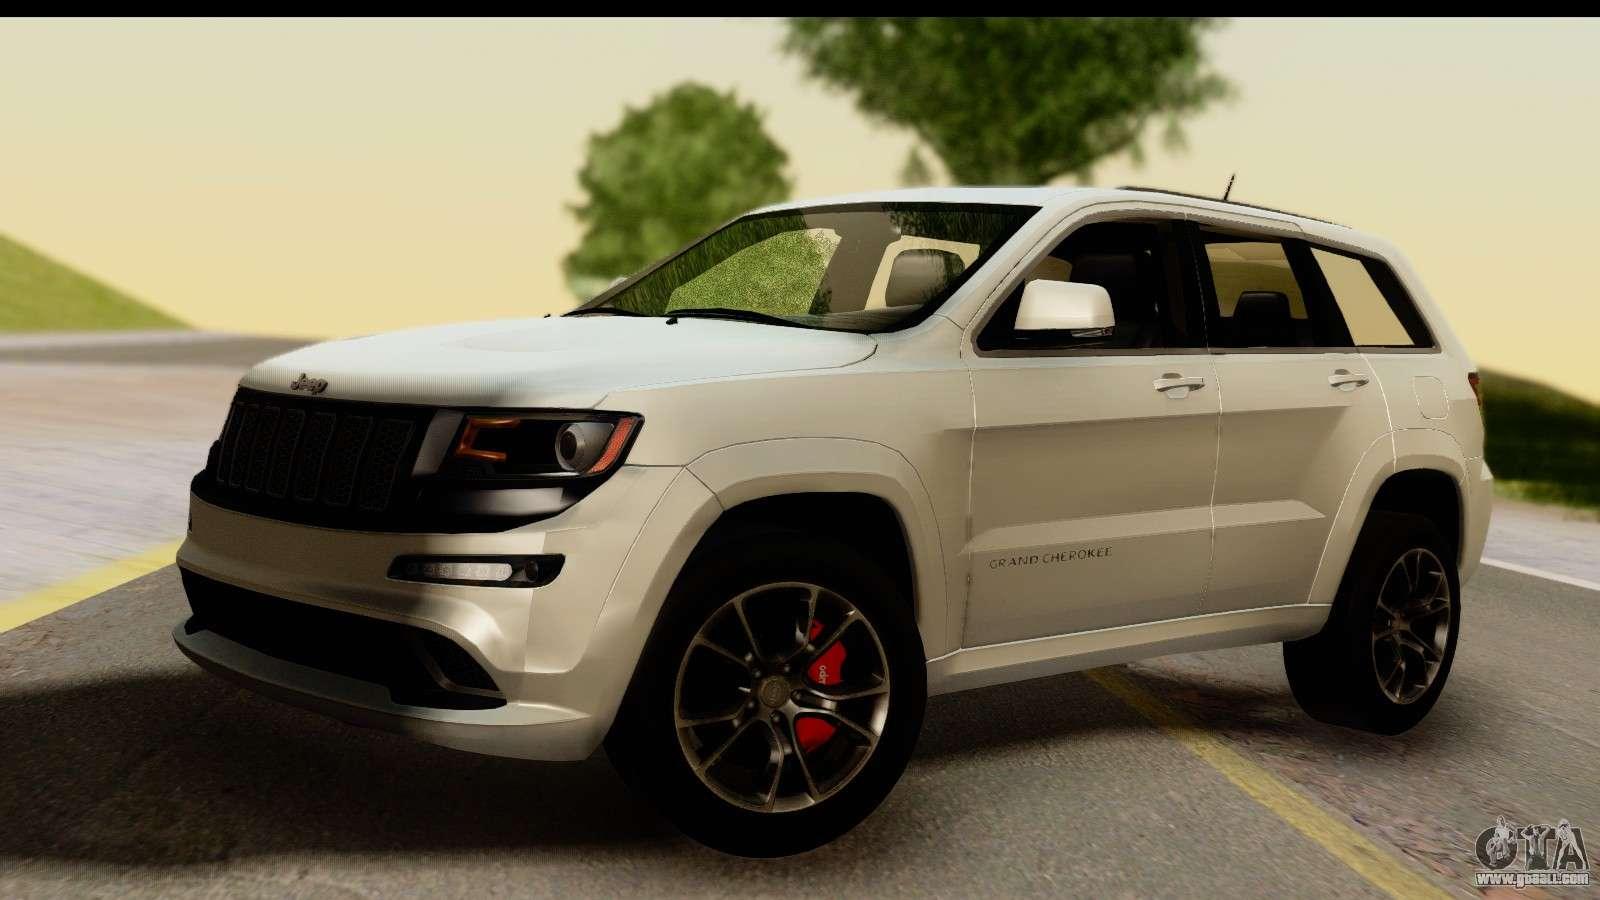 jeep grand cherokee srt8 2014 for gta san andreas. Black Bedroom Furniture Sets. Home Design Ideas